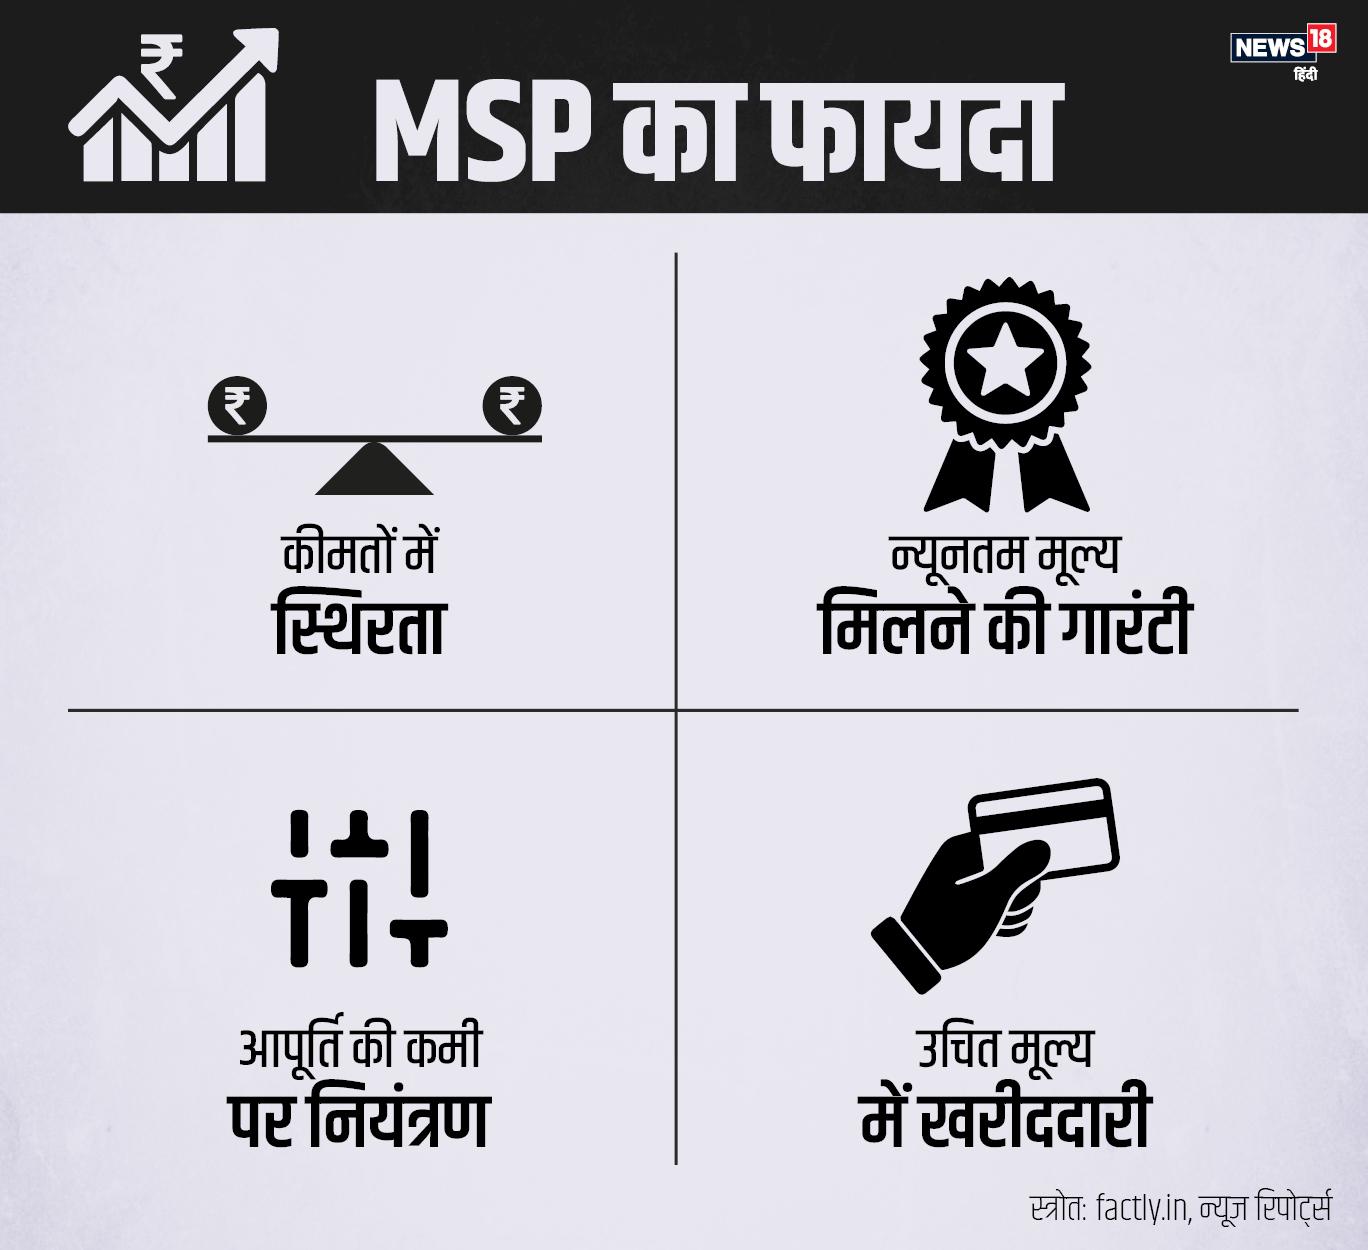 New laws on agriculture trade, Farmers news, MSP-Minimum Support Price, apmc mandi, Agri reforms, modi government, benefit of Agri reforms, कृषि कारोबार पर नया कानून, किसान समाचार, न्यूनतम समर्थन मूल्य, एमएसपी, एपीएमसी मंडी, कृषि सुधार, मोदी सरकार, कृषि सुधार का किसानों को लाभ